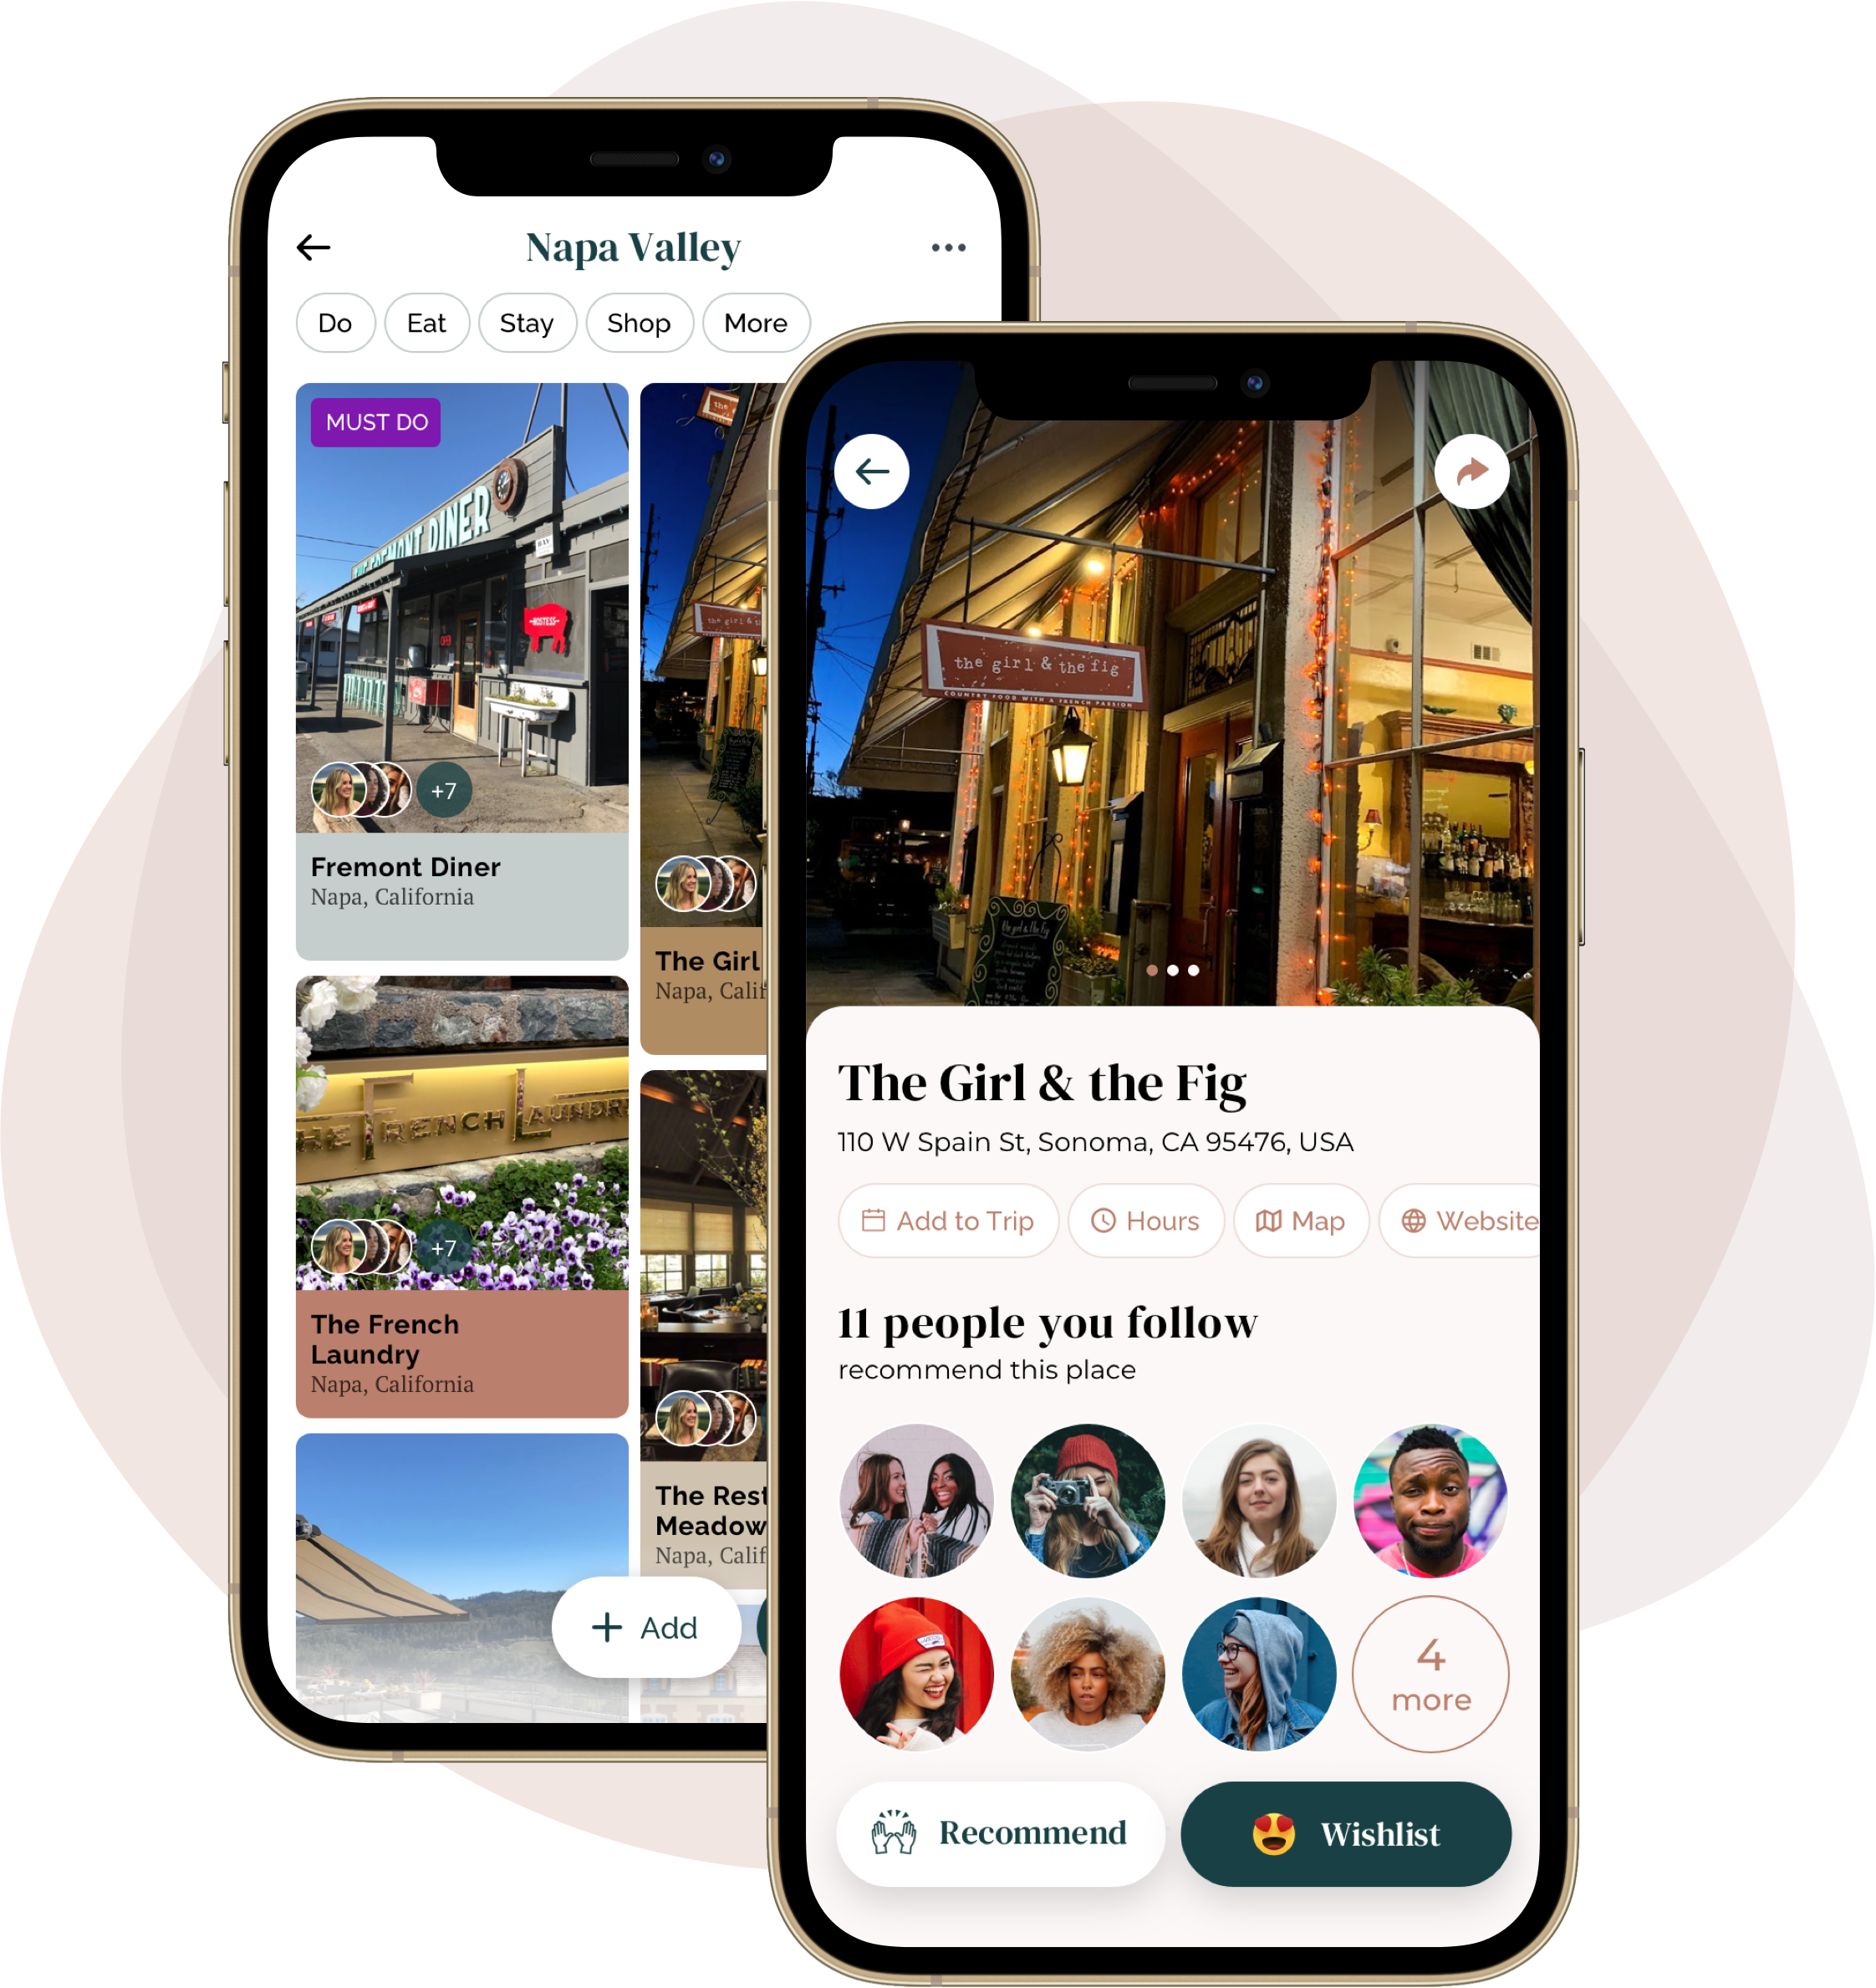 App screenshots of travel recommendations